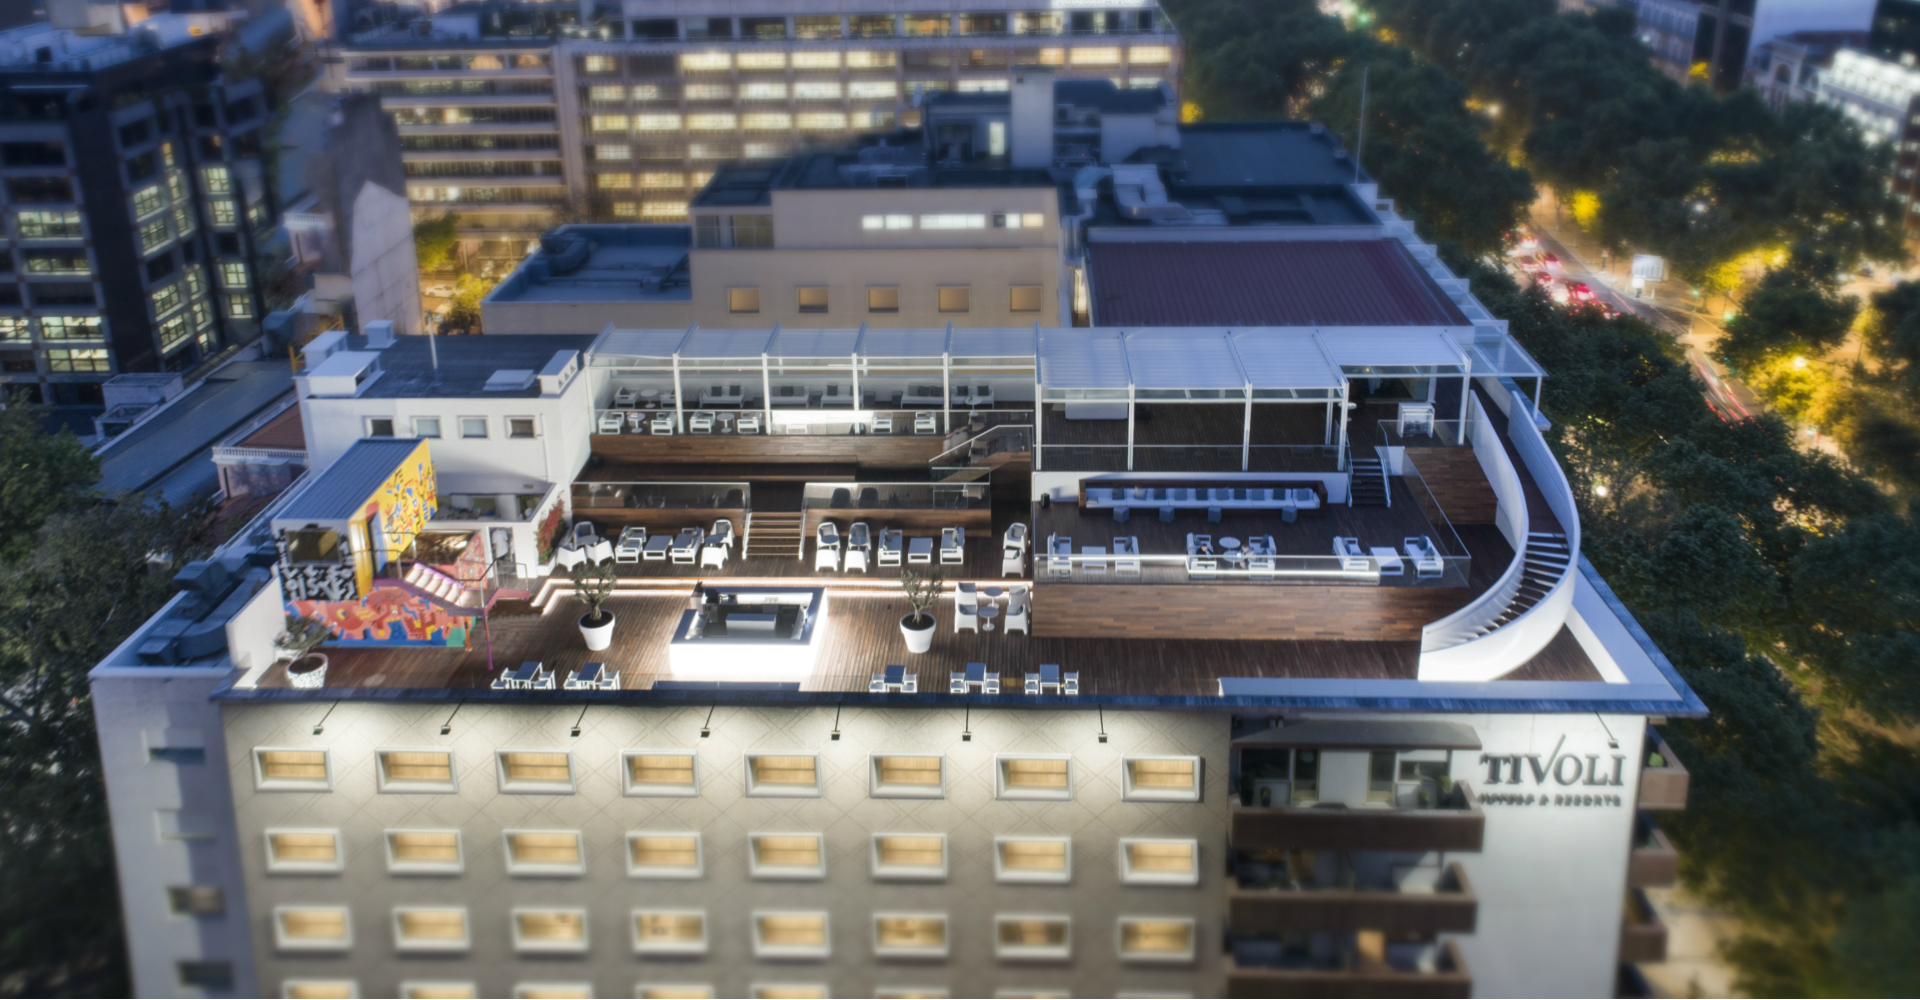 tivoli avenida liberdade hotel lisboa sky bar rooftop